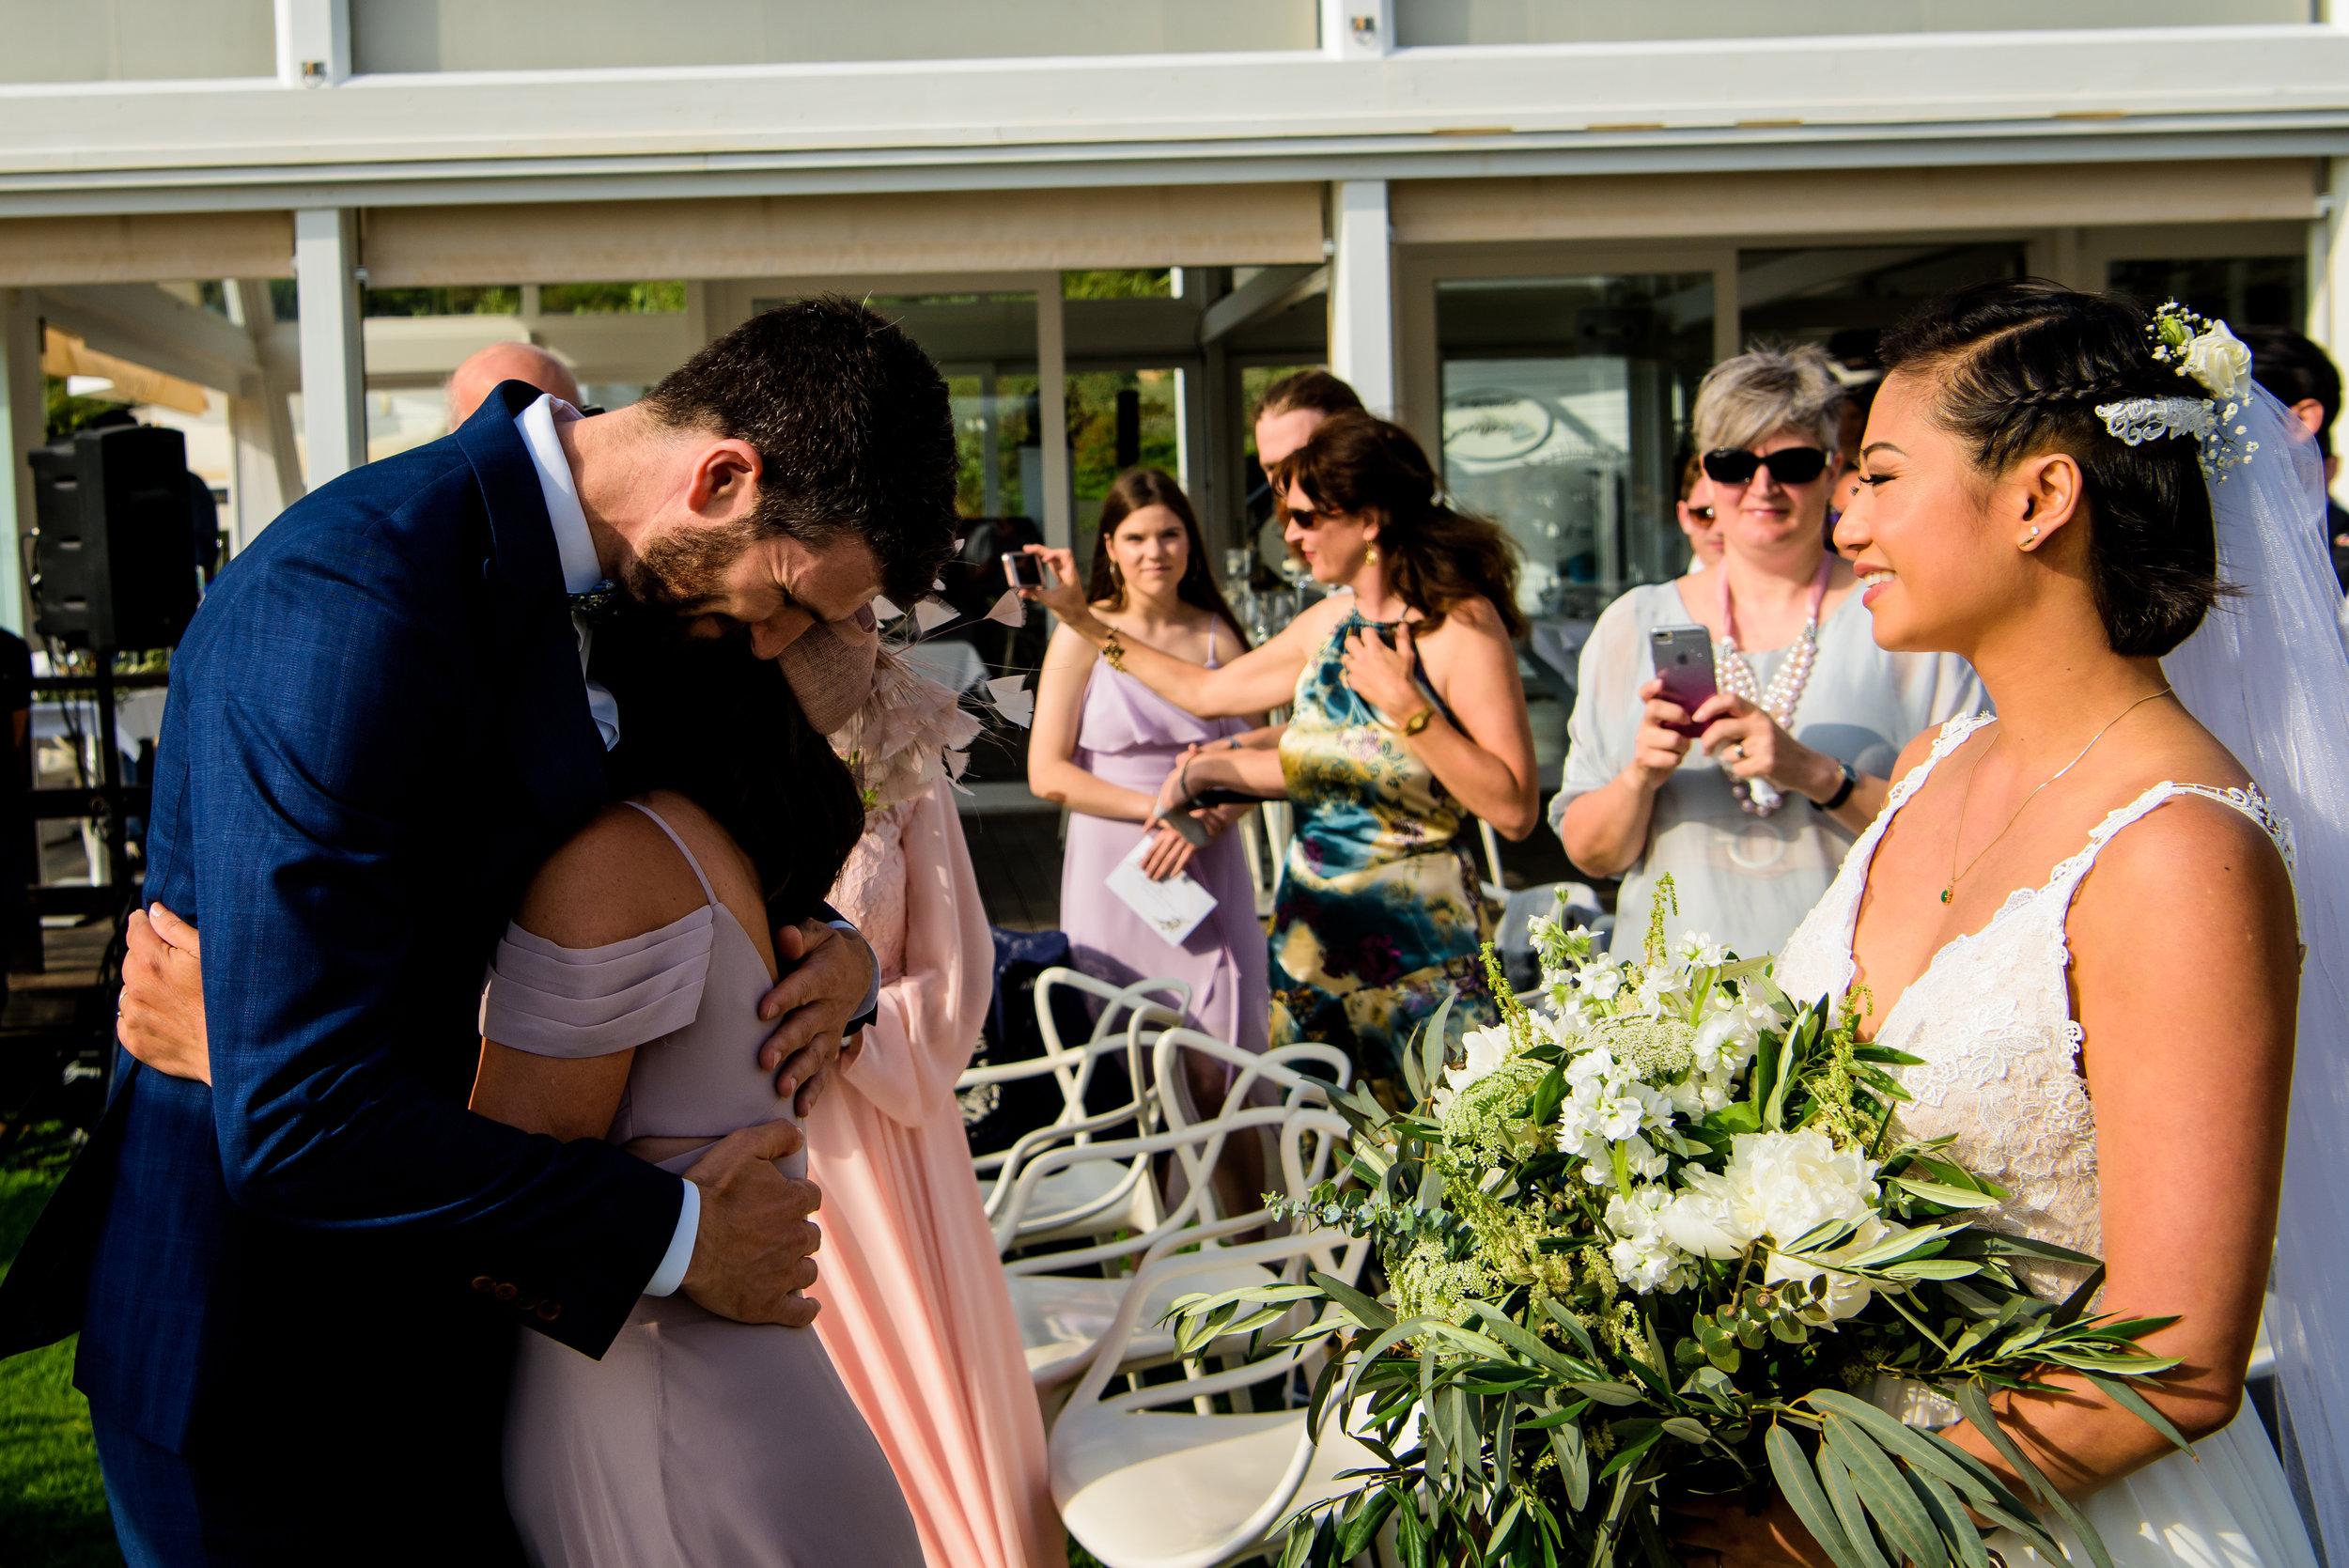 minty-frank-wedding-favorites-109.jpg